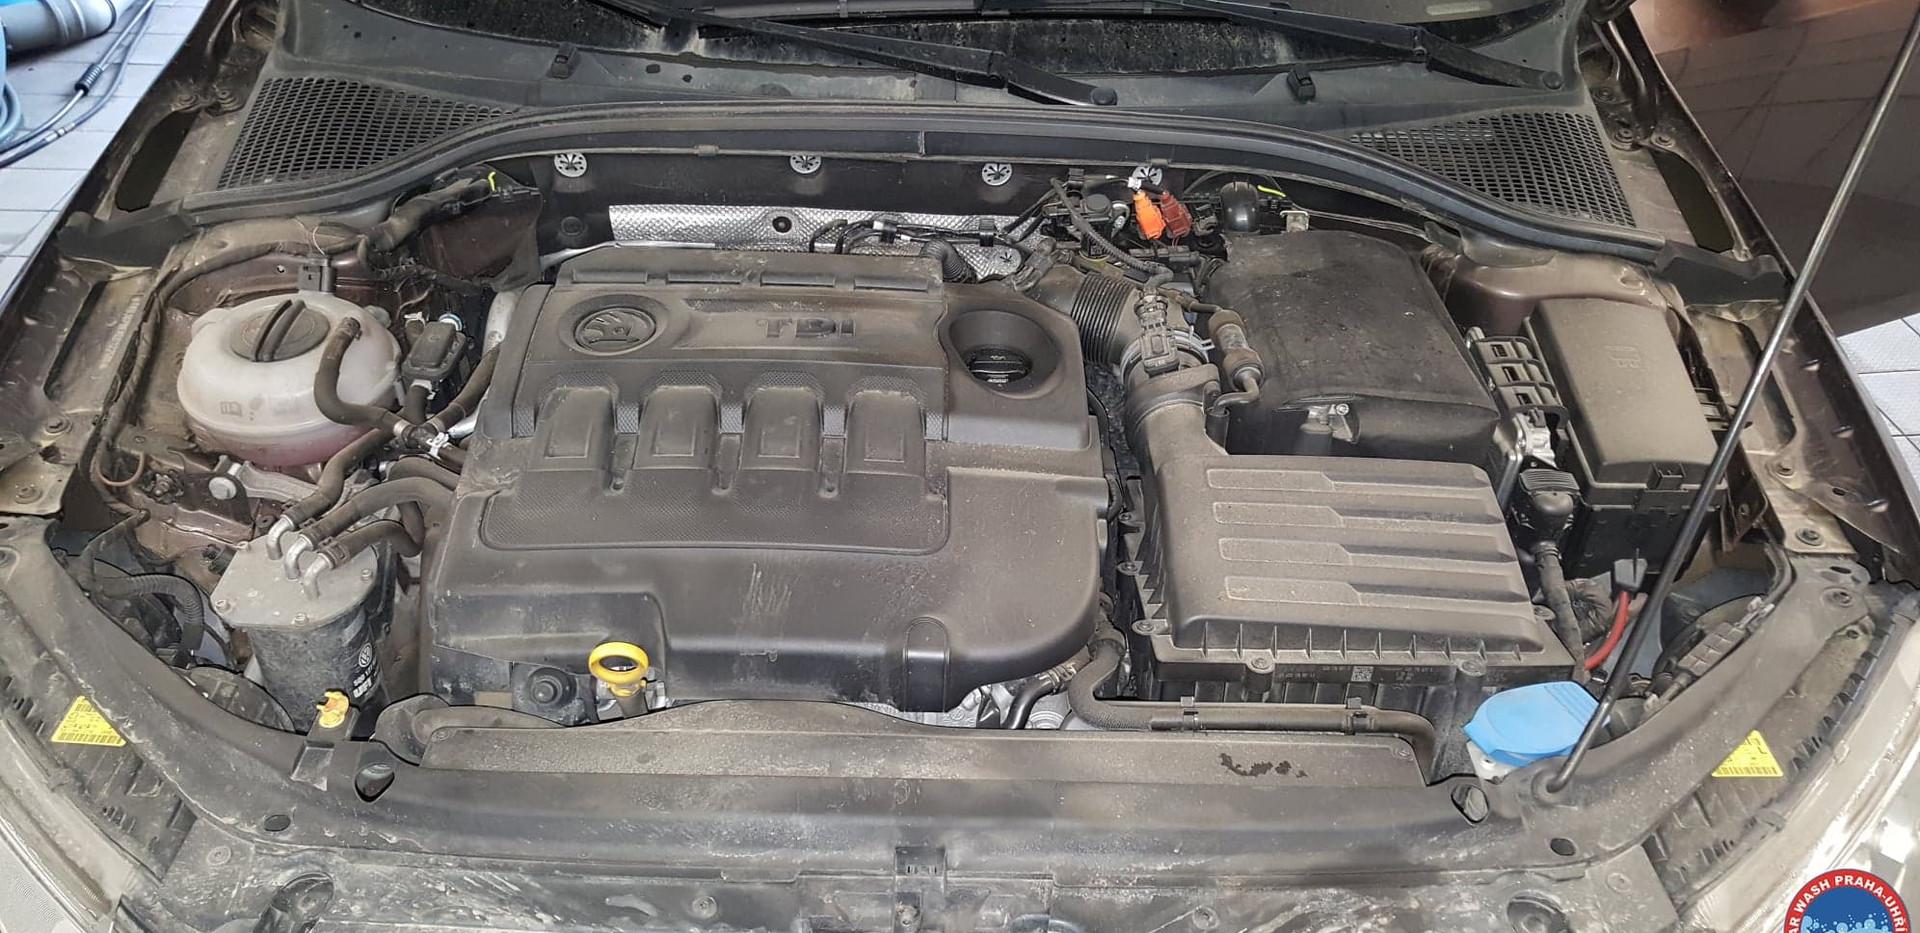 Car Wash - Cisteni motoru (20).jpg